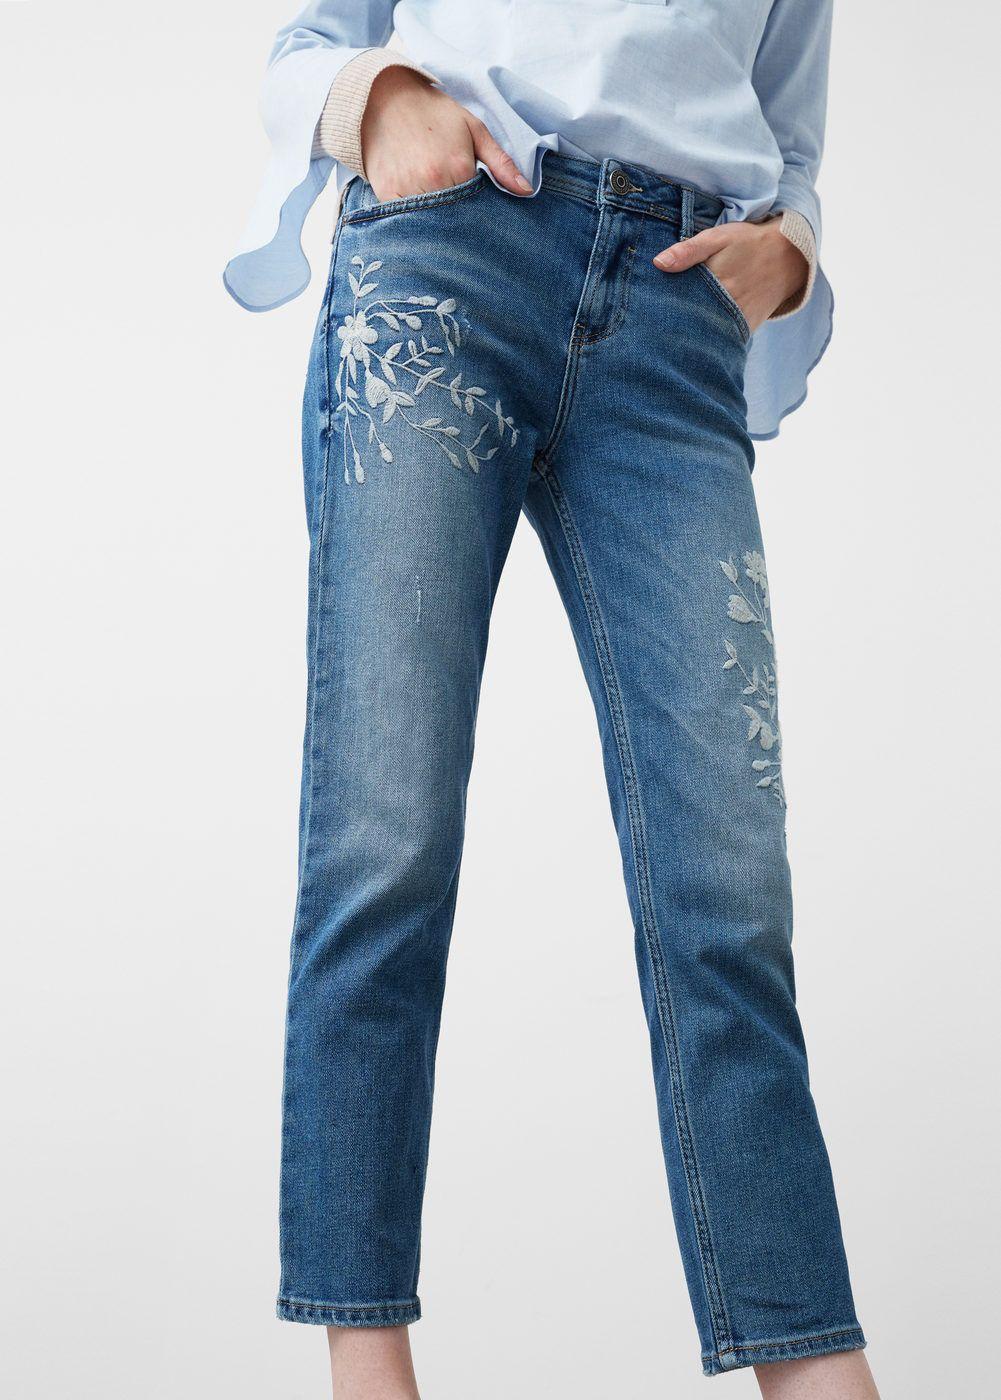 549edc7e541 Jeans straight bordados crotia - Mujer en 2019 | Closet wishes ...